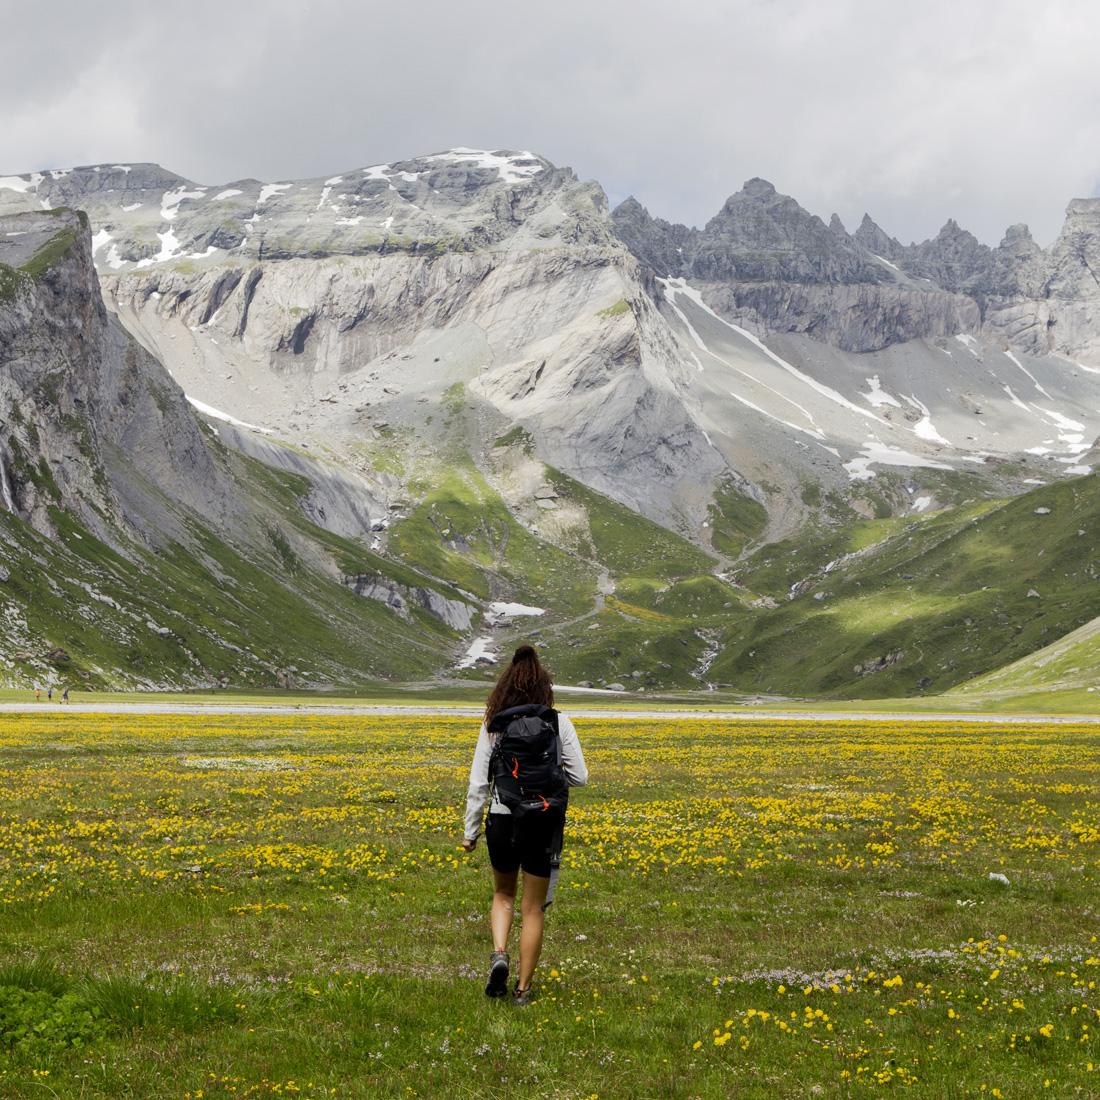 Summer in Flims Switzerland – Hiking Via ferrata turquoise lakes